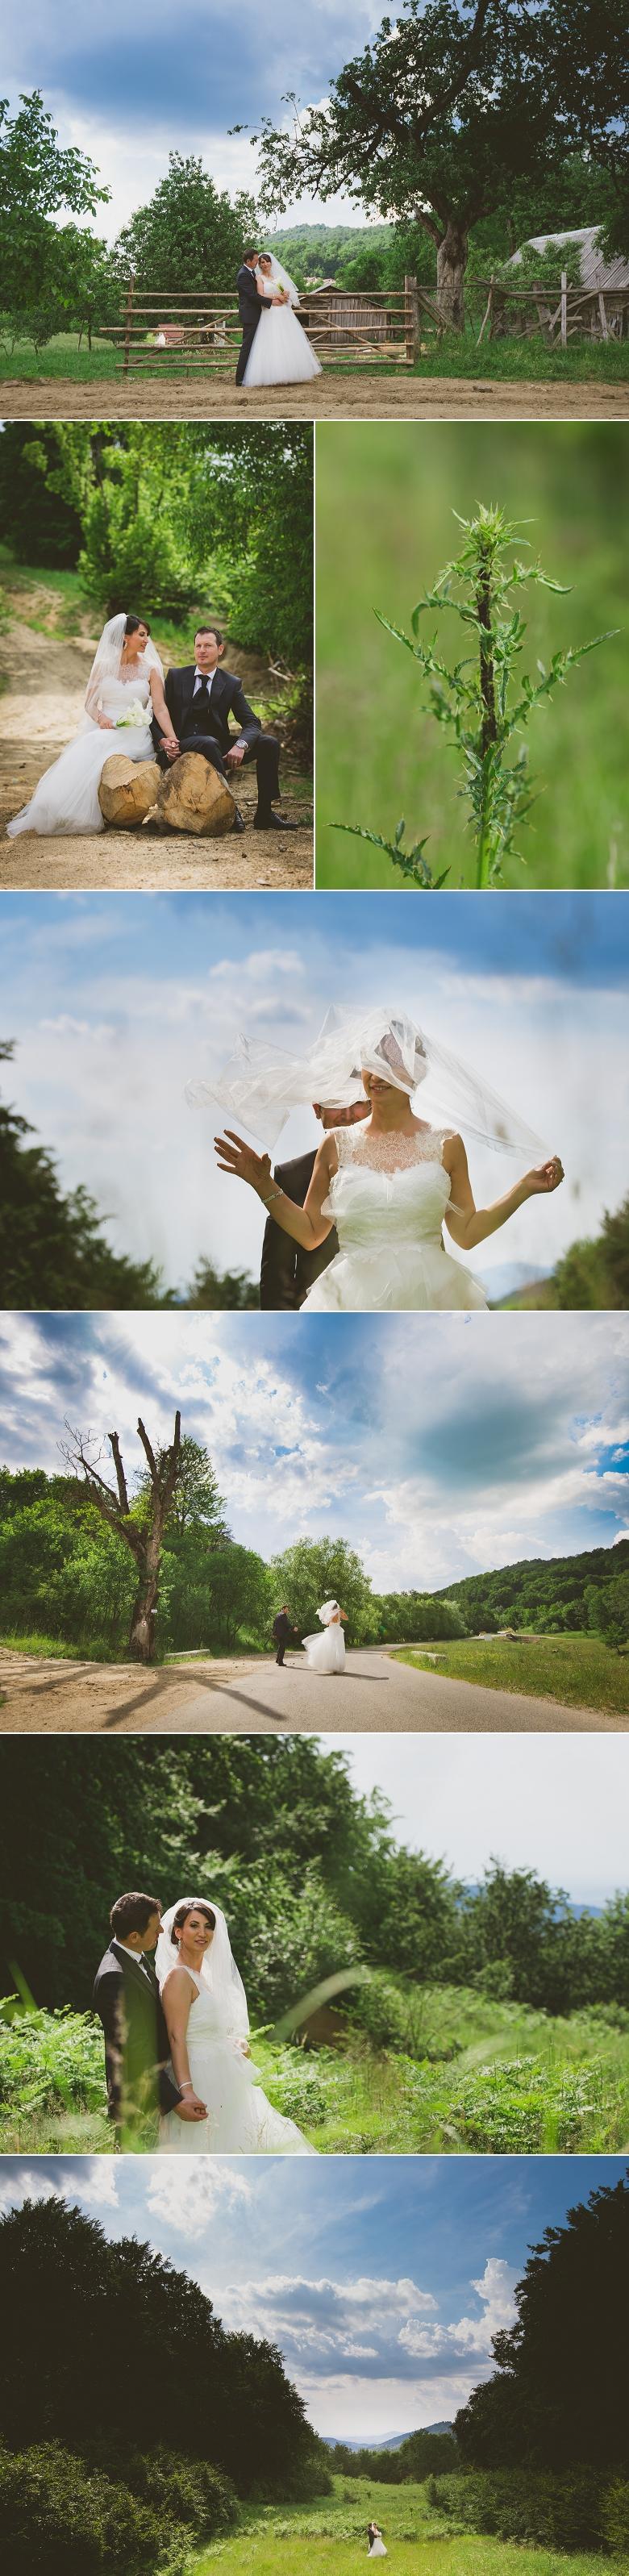 sedinta_foto_dupa_nunta_negresti_satu_mare_after_weeding_satu_mare_trash_the_dress_satu_mare 4